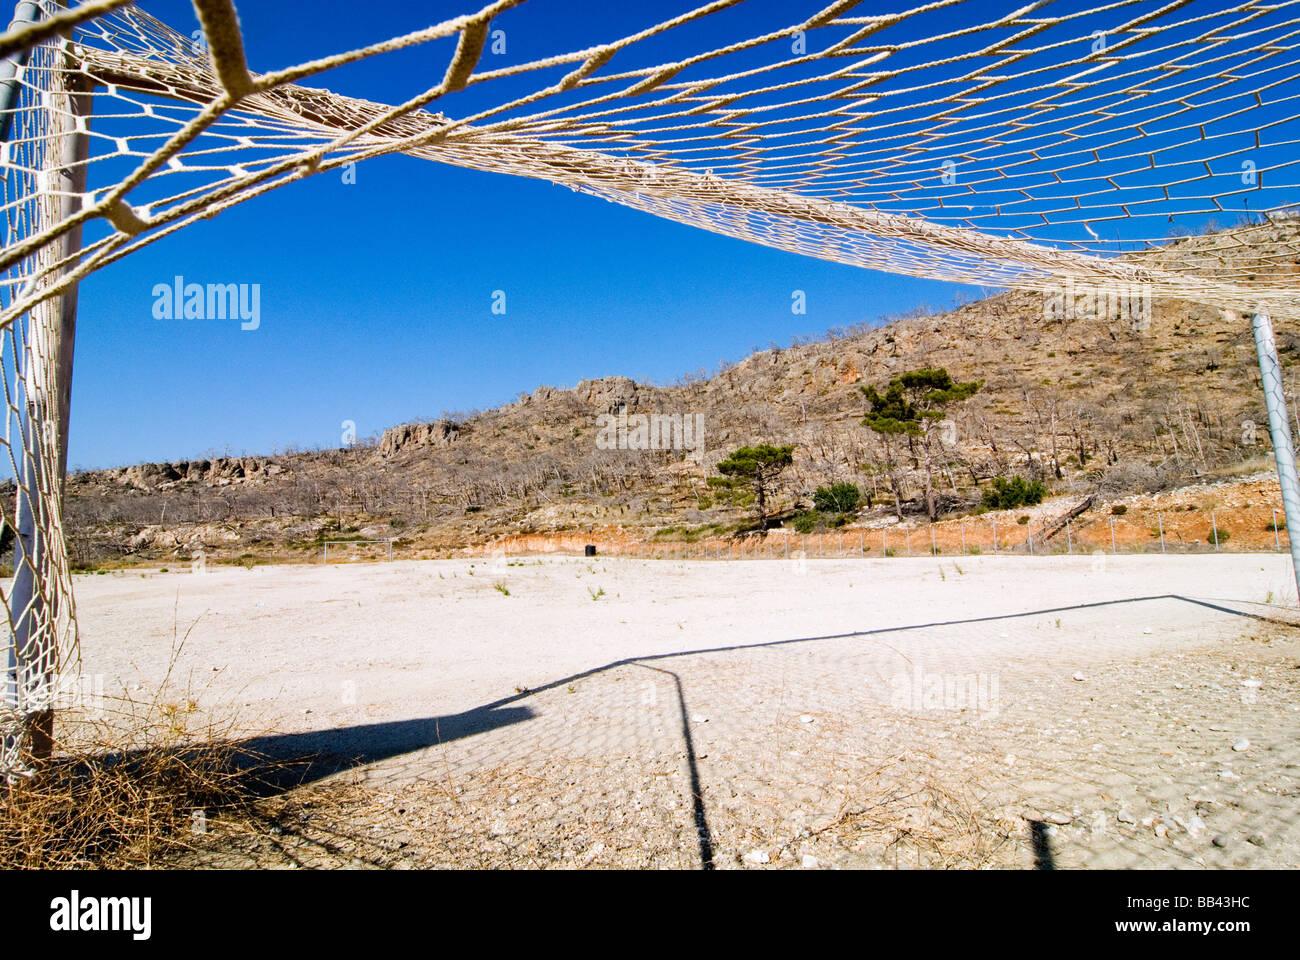 Greek Island Karpathos: Soccerfield in poor landscape. Stock Photo